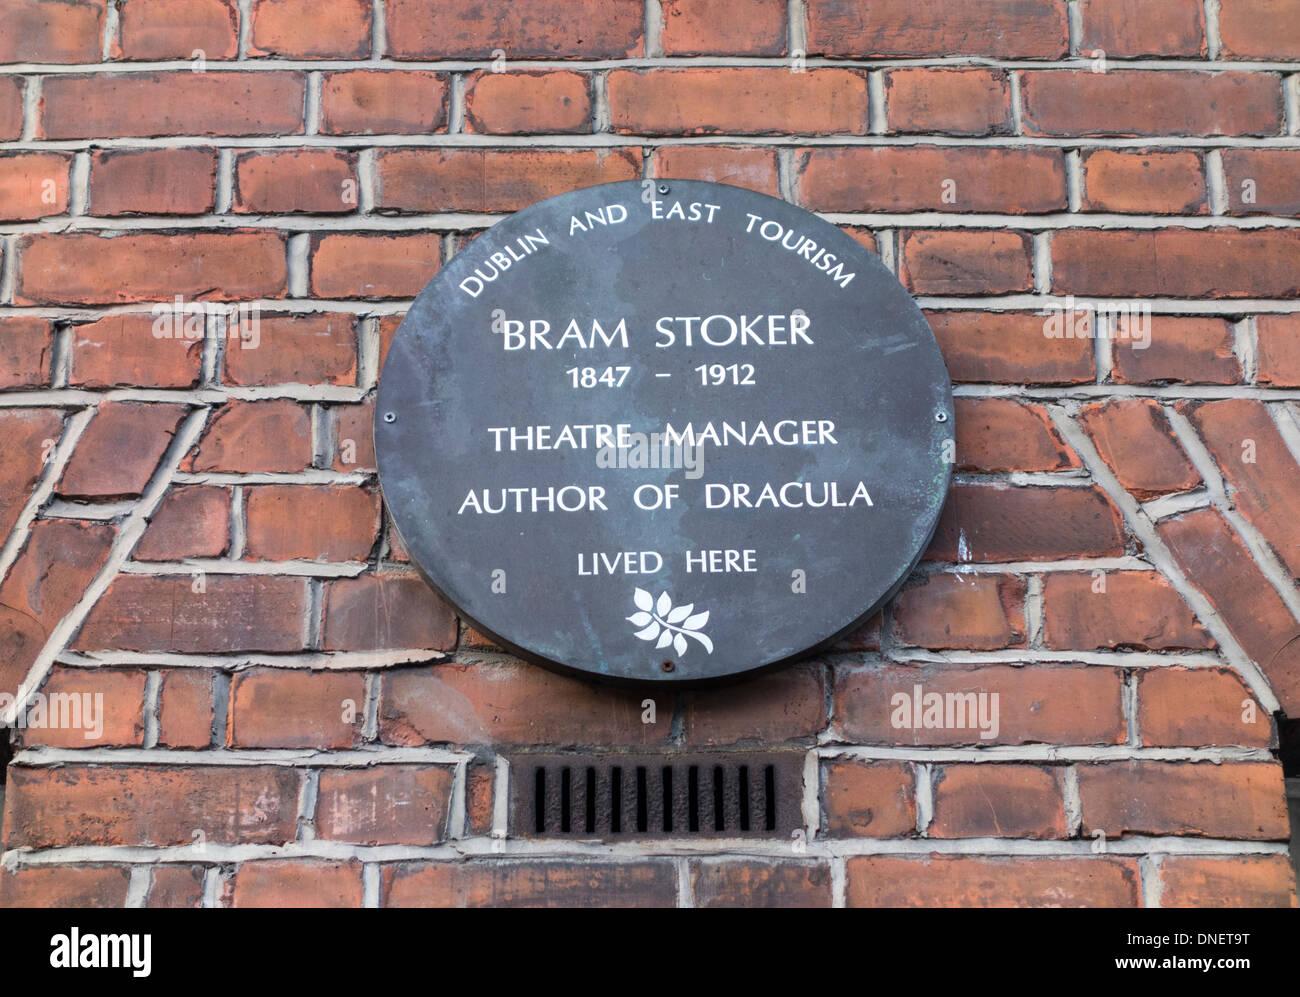 plaque commemorating Bram Stoker at 30 Kildare Street, Dublin, Ireland - Stock Image